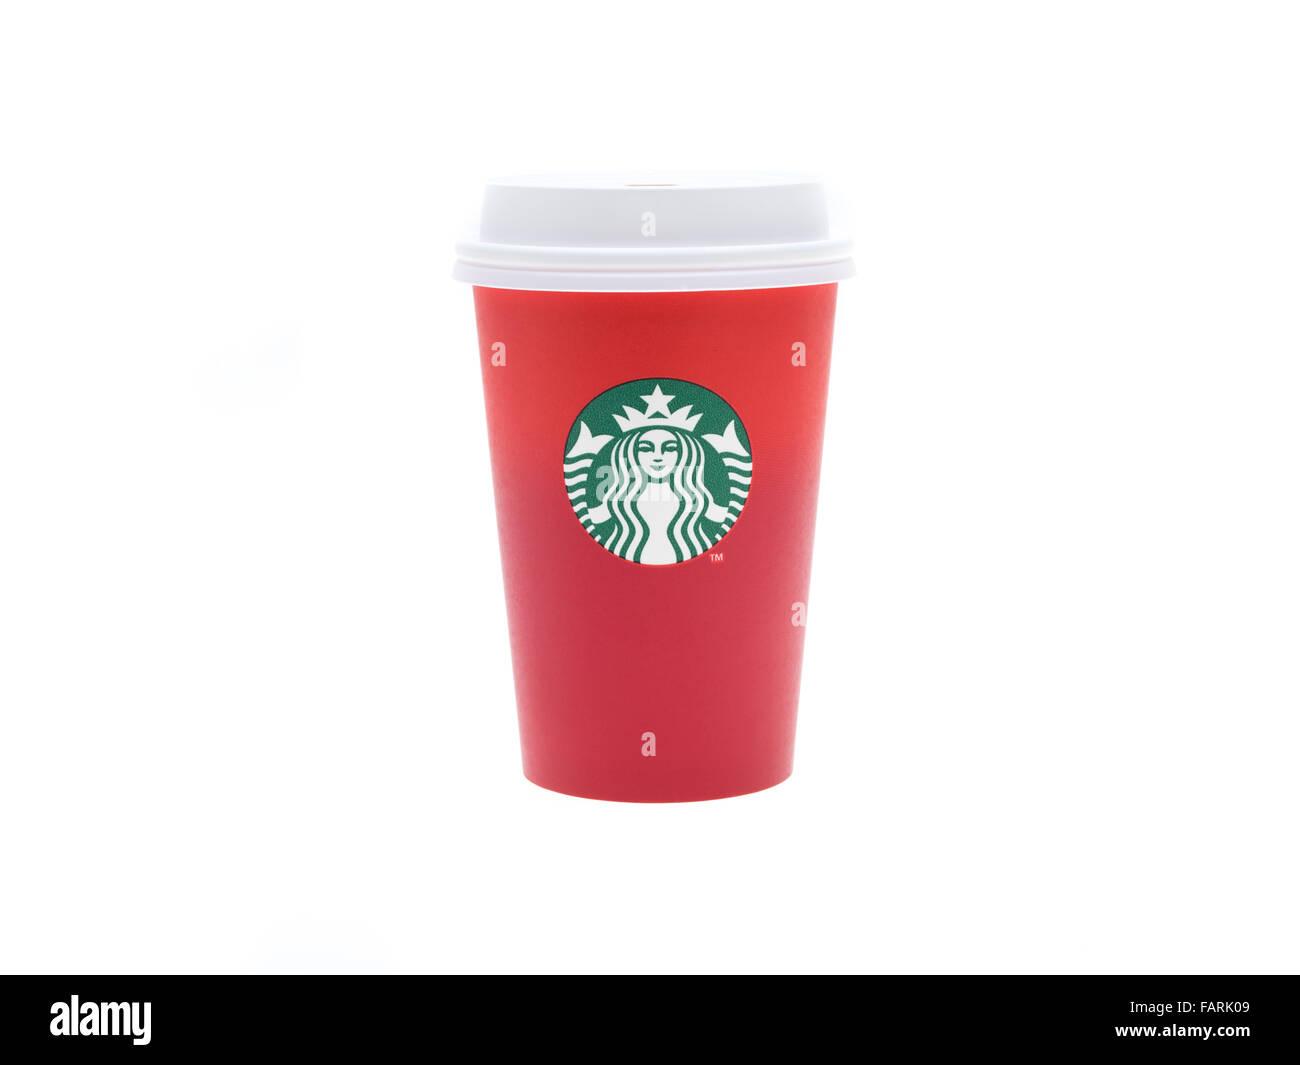 Starbucks And Christmas Stock Photos & Starbucks And Christmas Stock ...